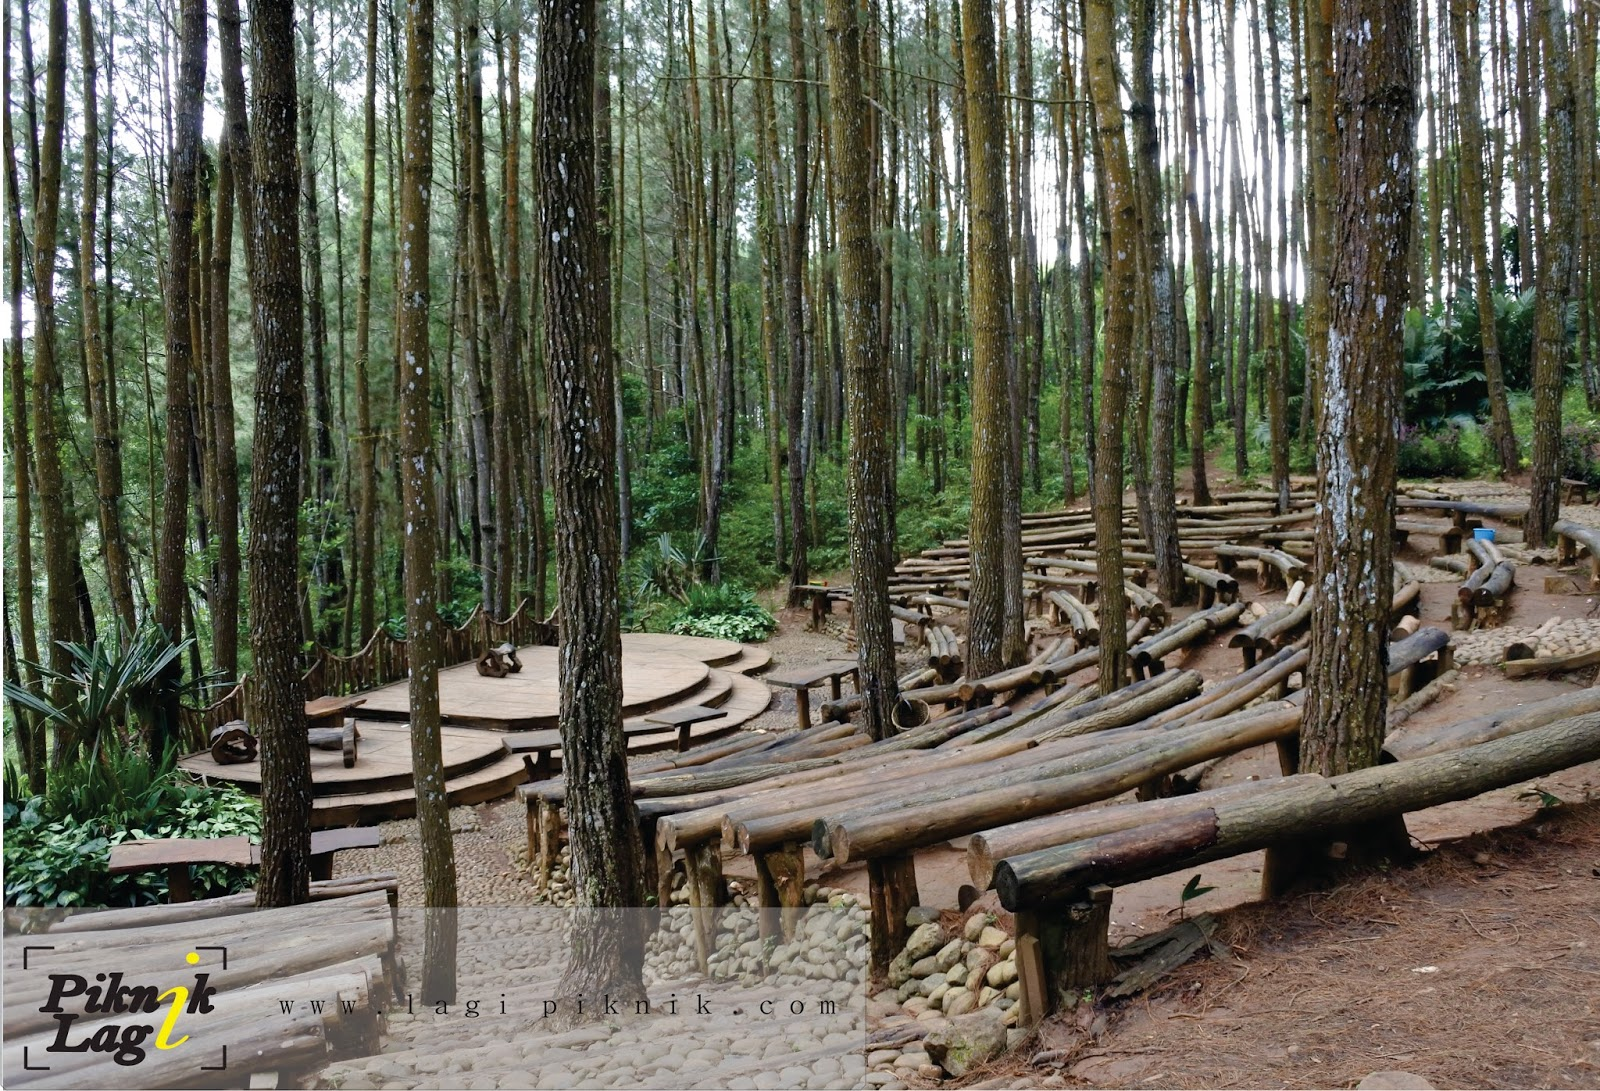 Hutan Pinus Imogiri | PIKNIK LAGI